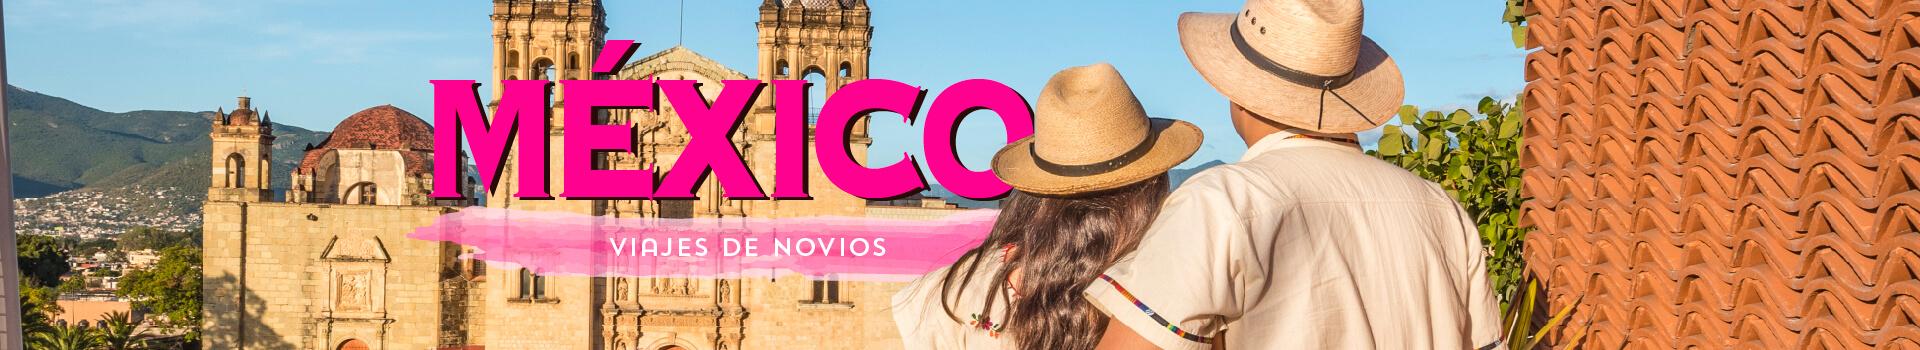 Viajes de novios México 2020